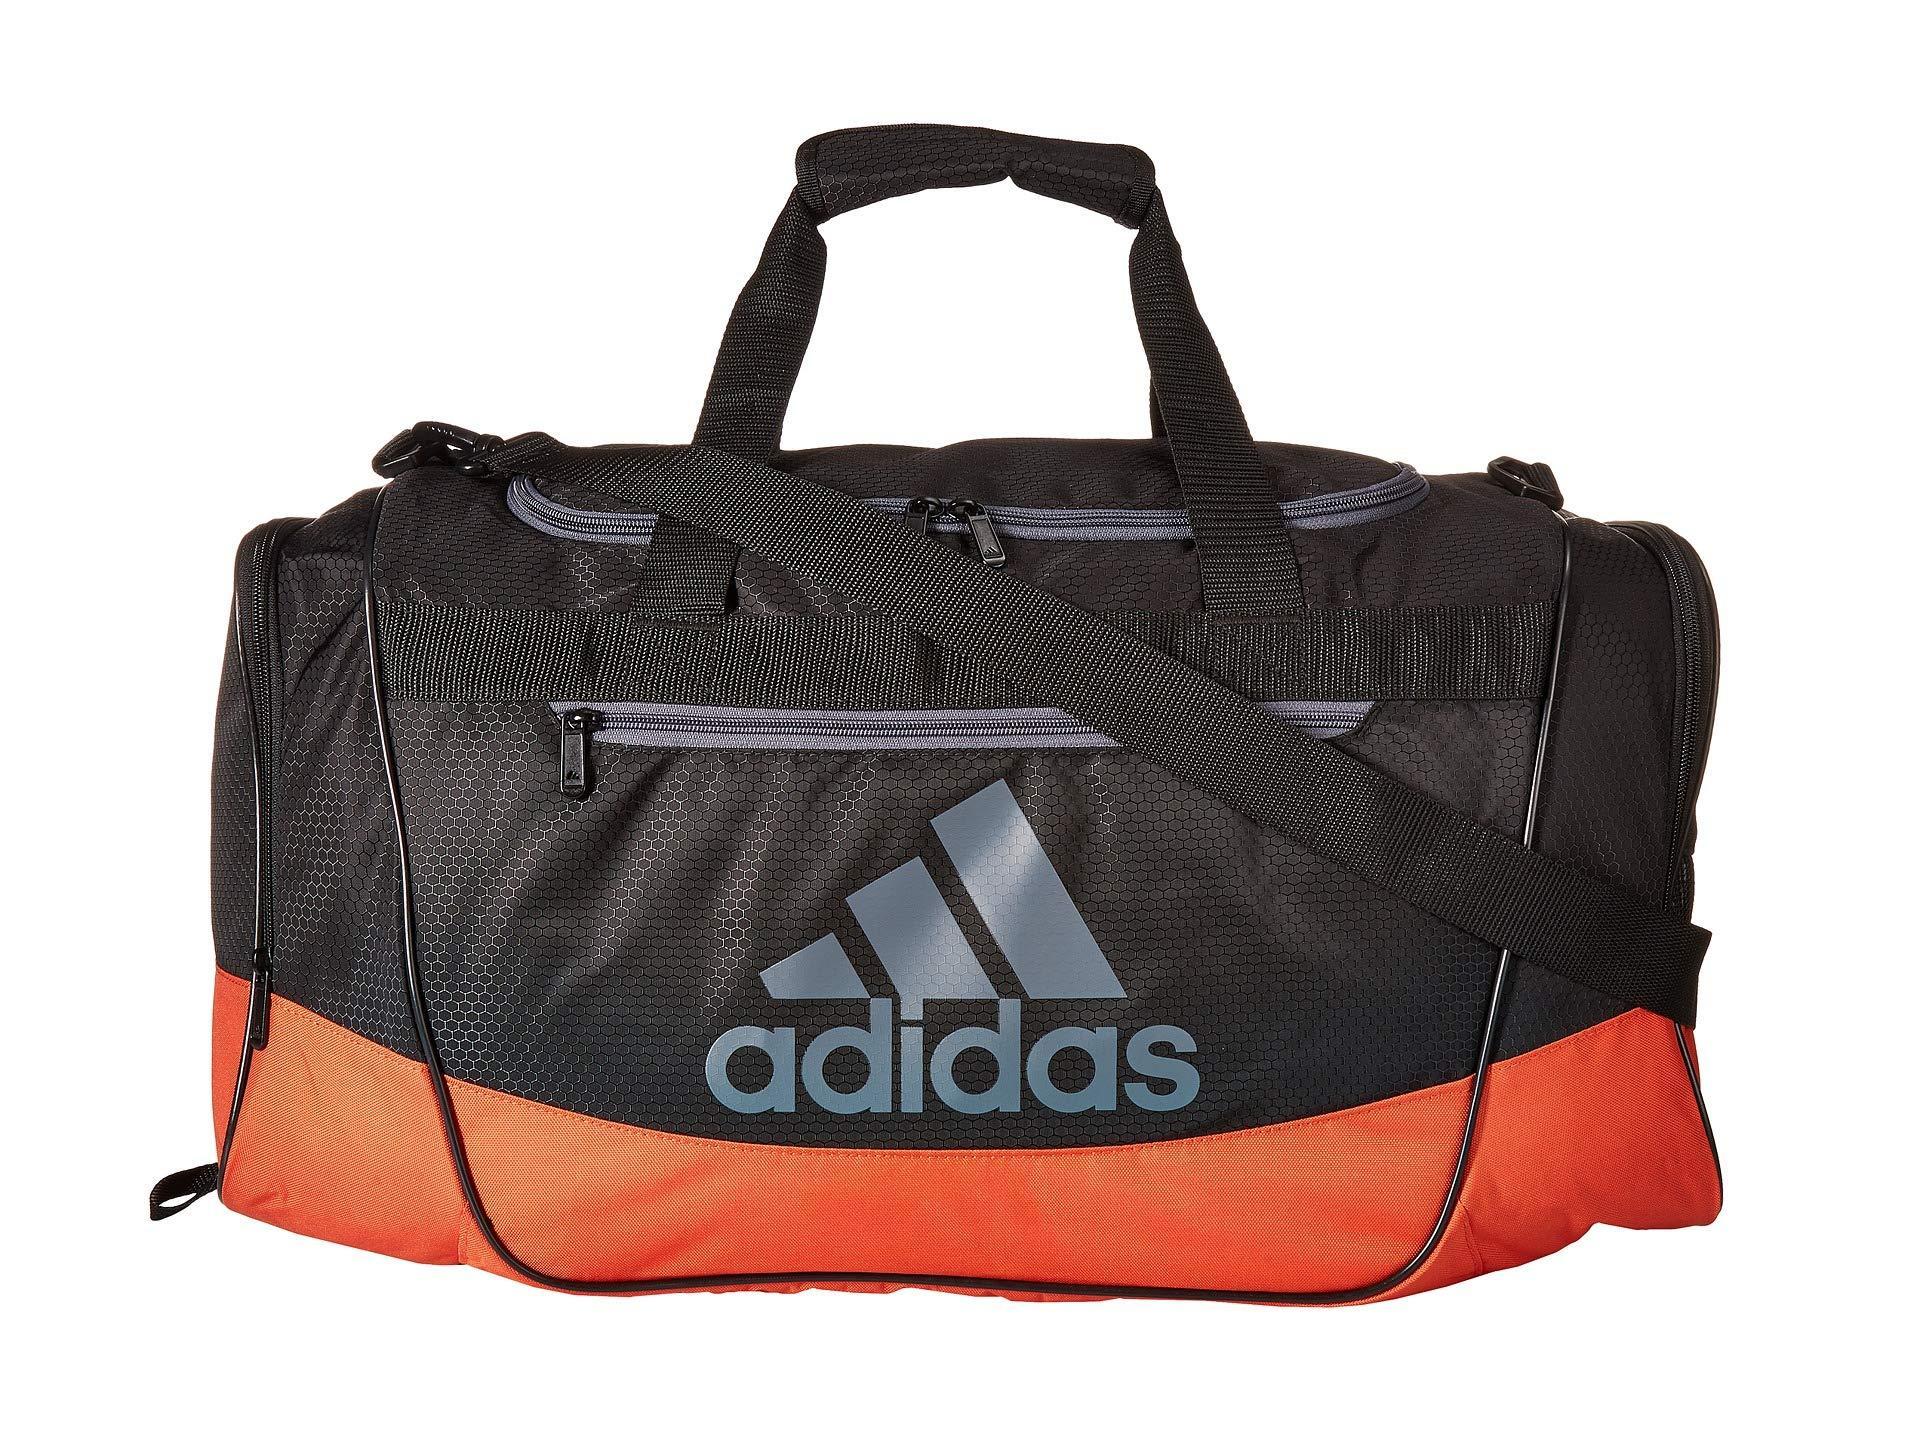 9c9e10e39 Adidas - Black Defender Iii Medium Duffel - Lyst. View fullscreen